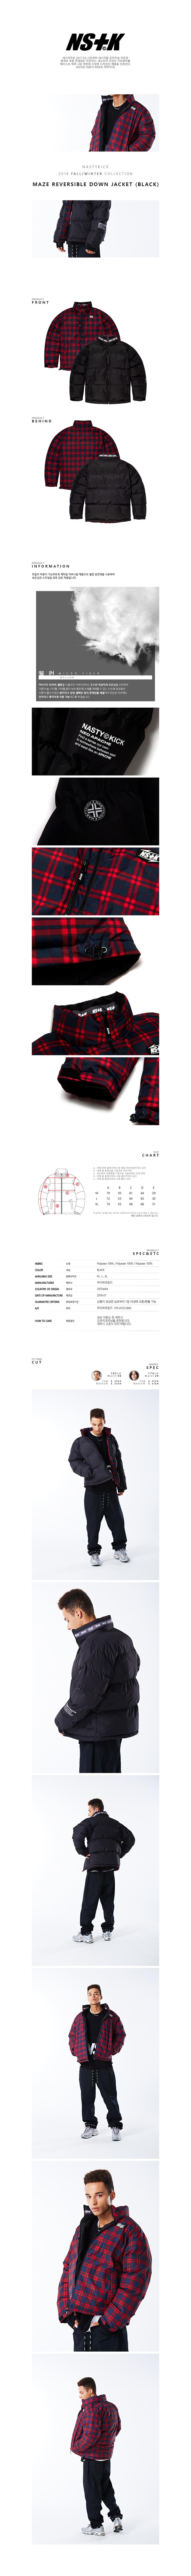 [NK] MAZE REVERSIBLE DOWN JACKET (BLACK).jpg